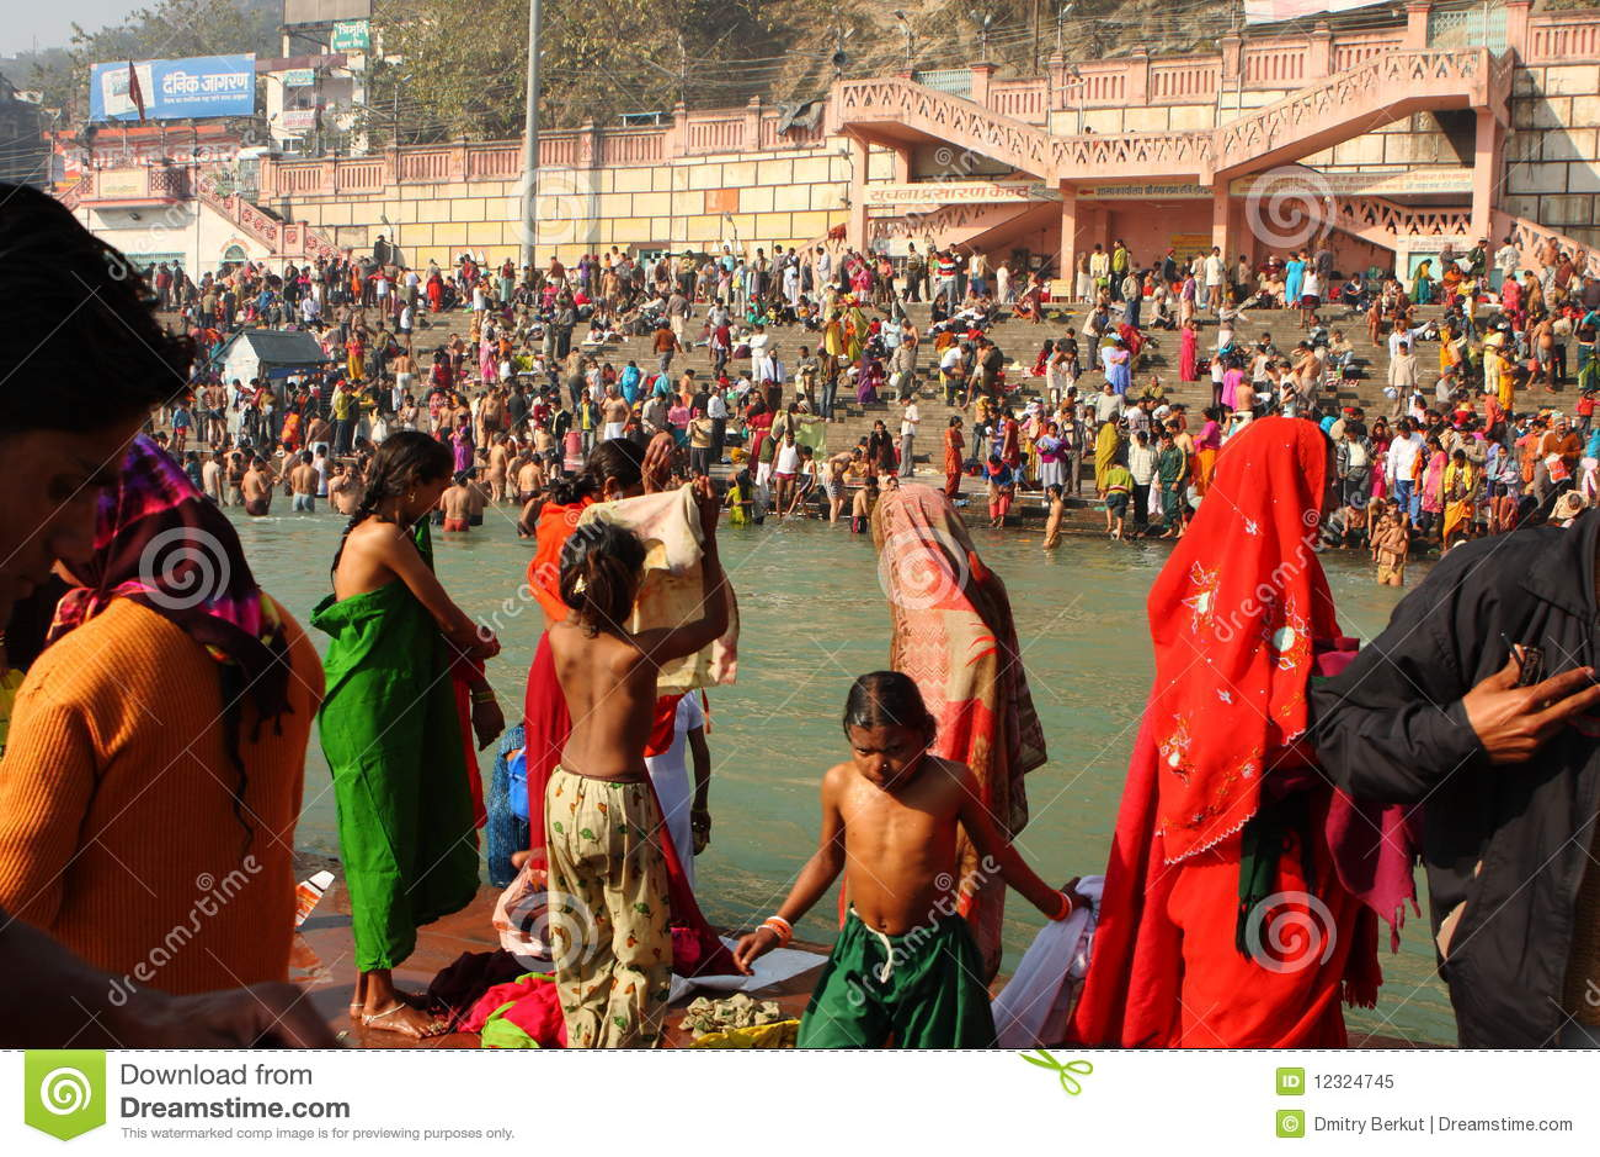 http://burnsnight2016.blogspot.in/2016/01/pongal-celebration-customs-legends.html